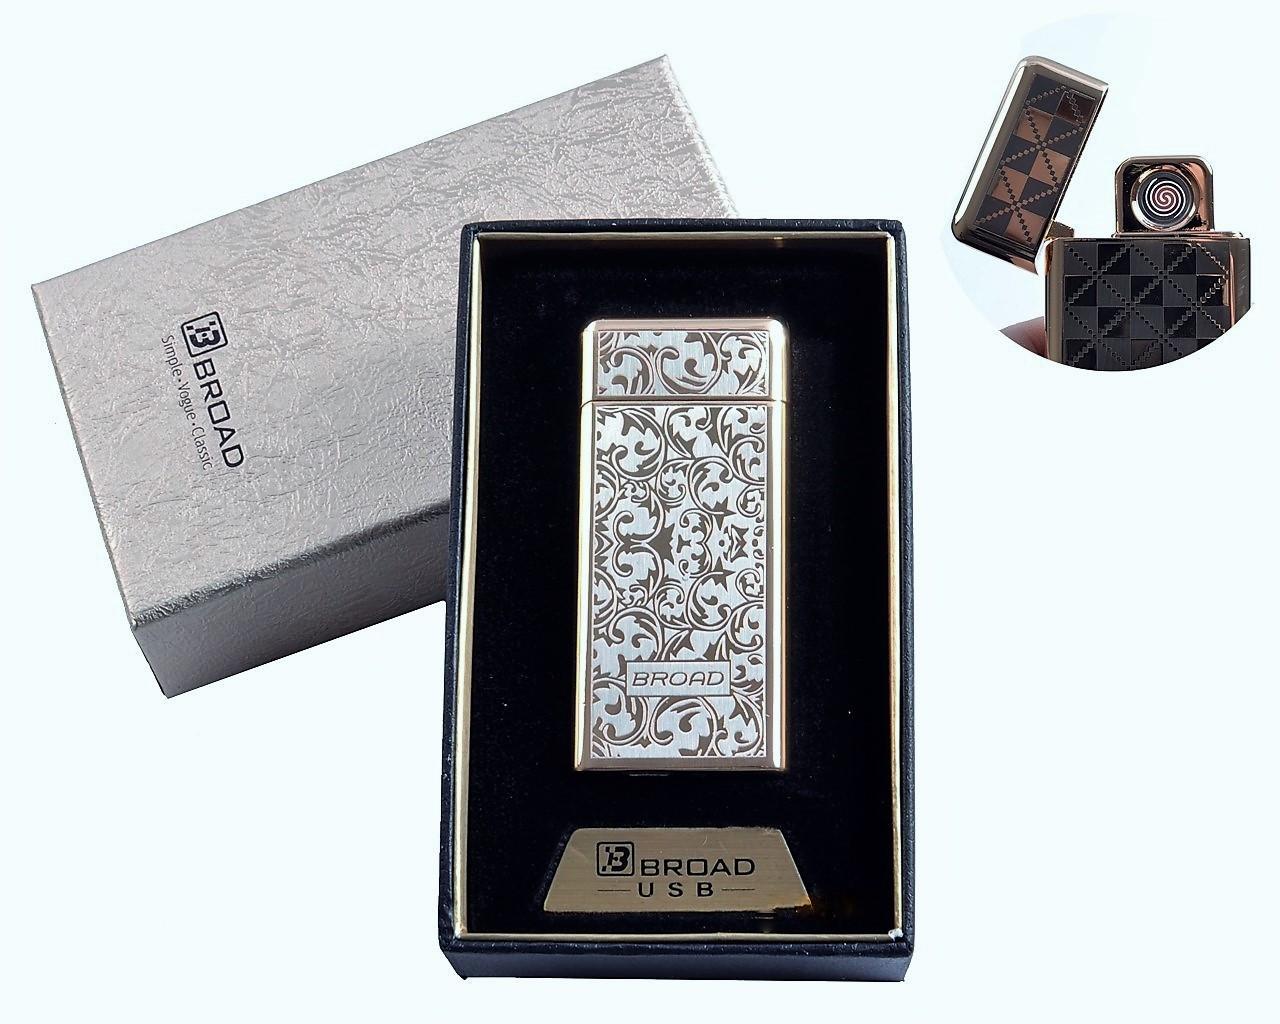 "Спиральная USB зажигалка ""Broad"" №4850-3, двухсторонняя спираль накаливания, в подарочной коробке"